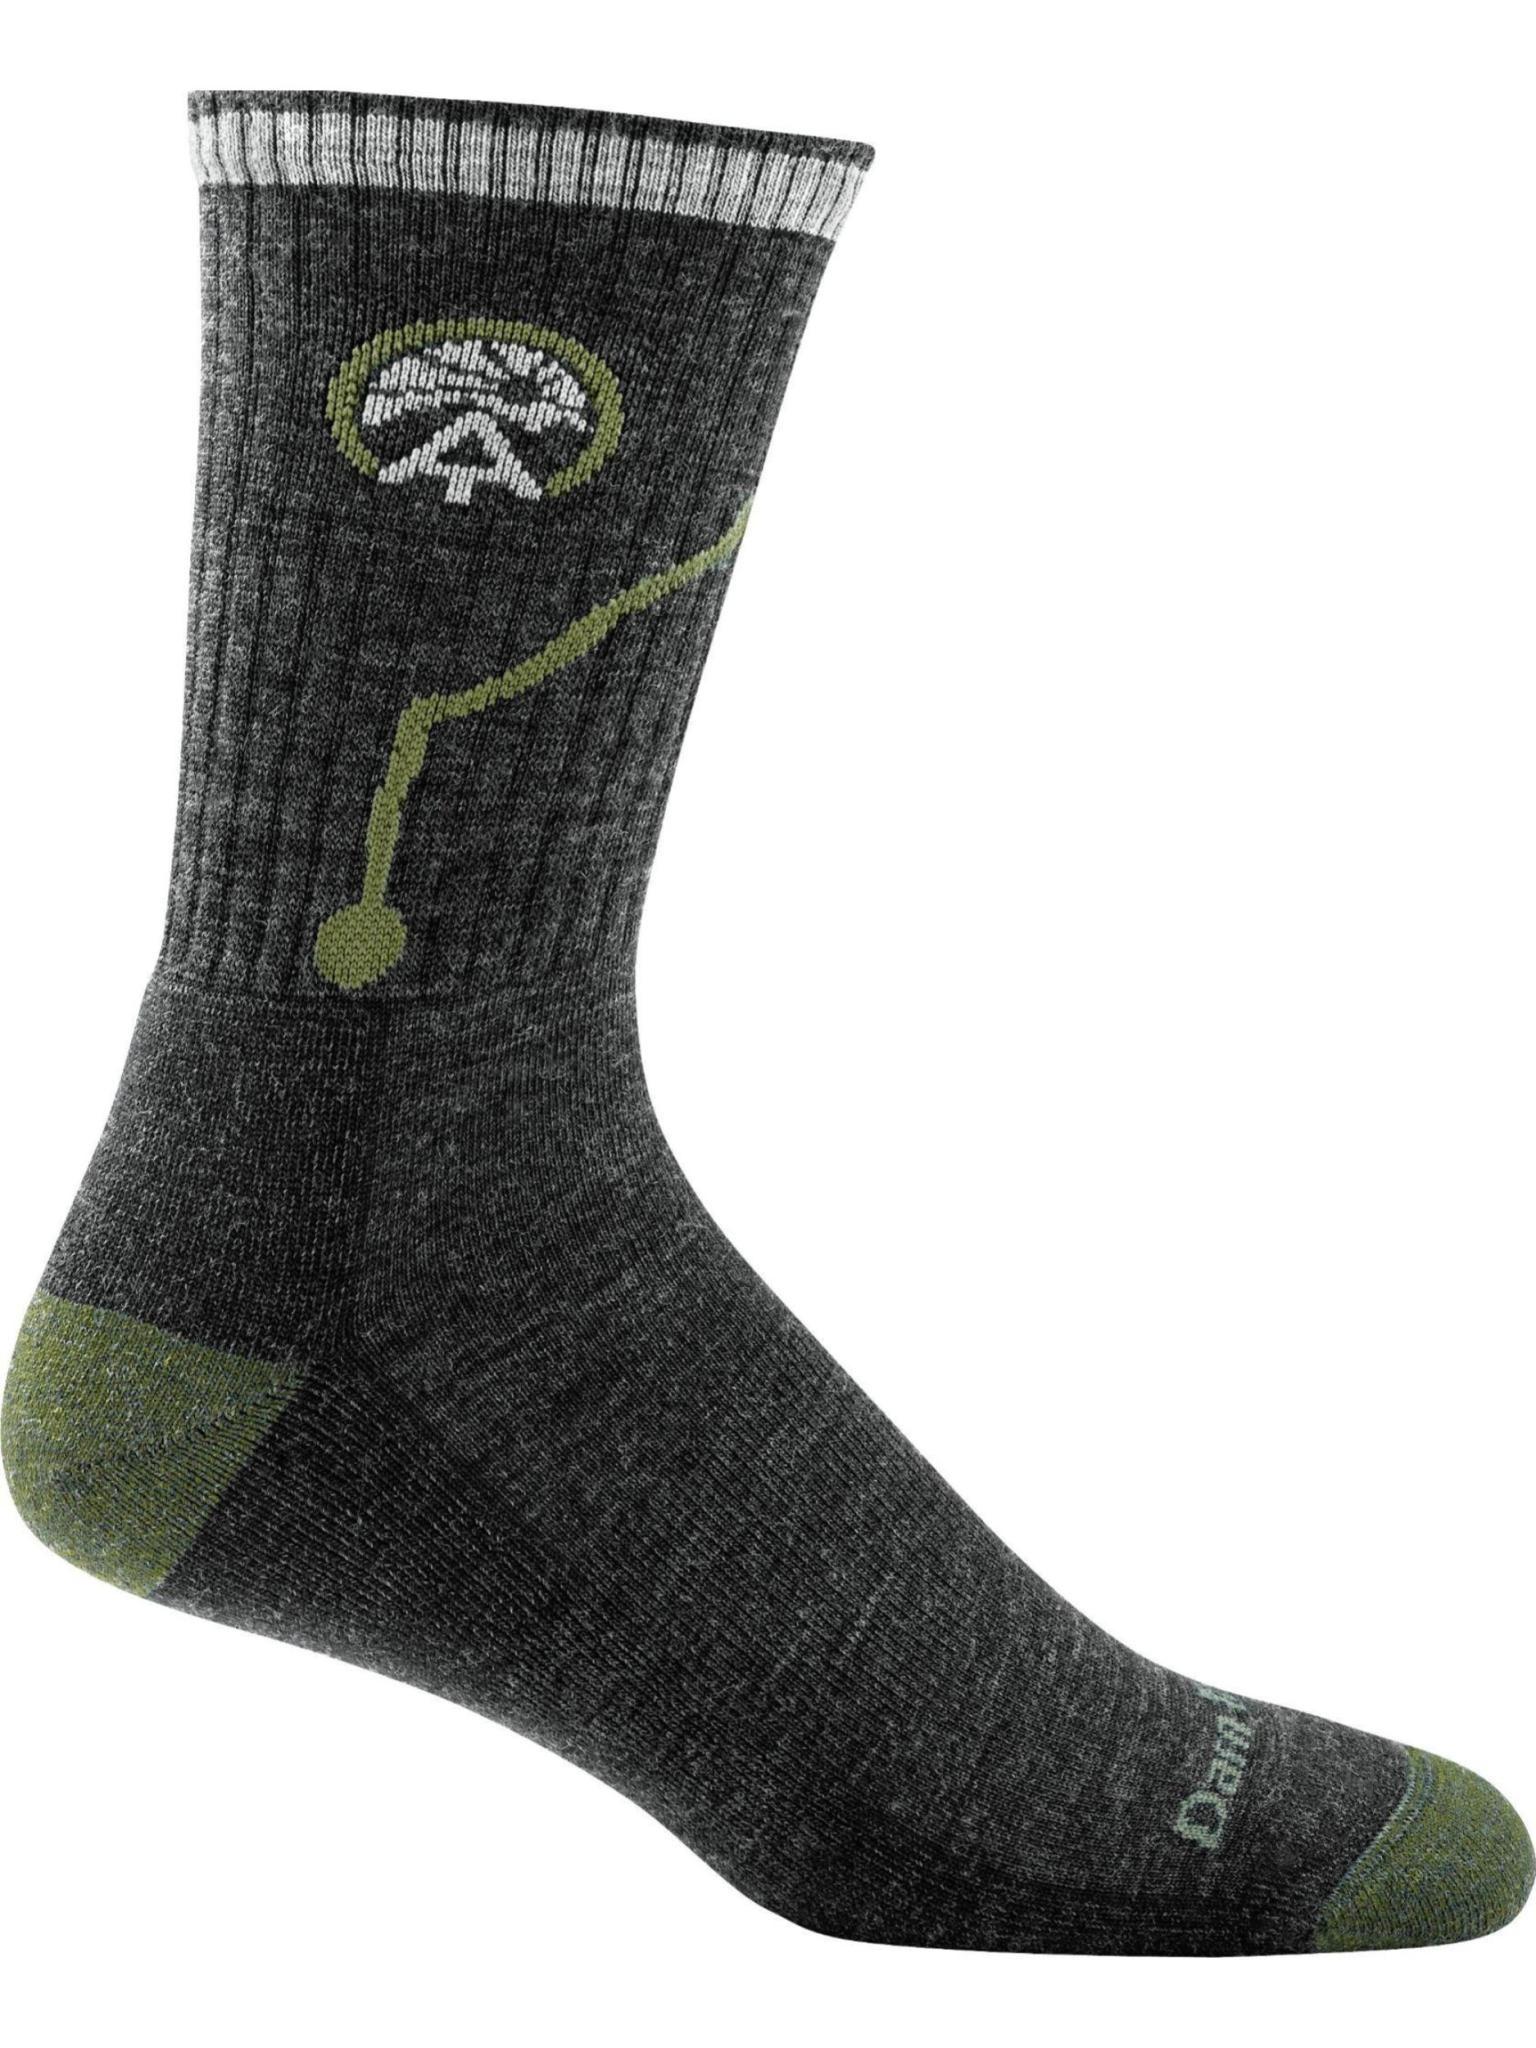 Darn Tough Men's ATC Midweight Cushion Micro Crew Hike Sock